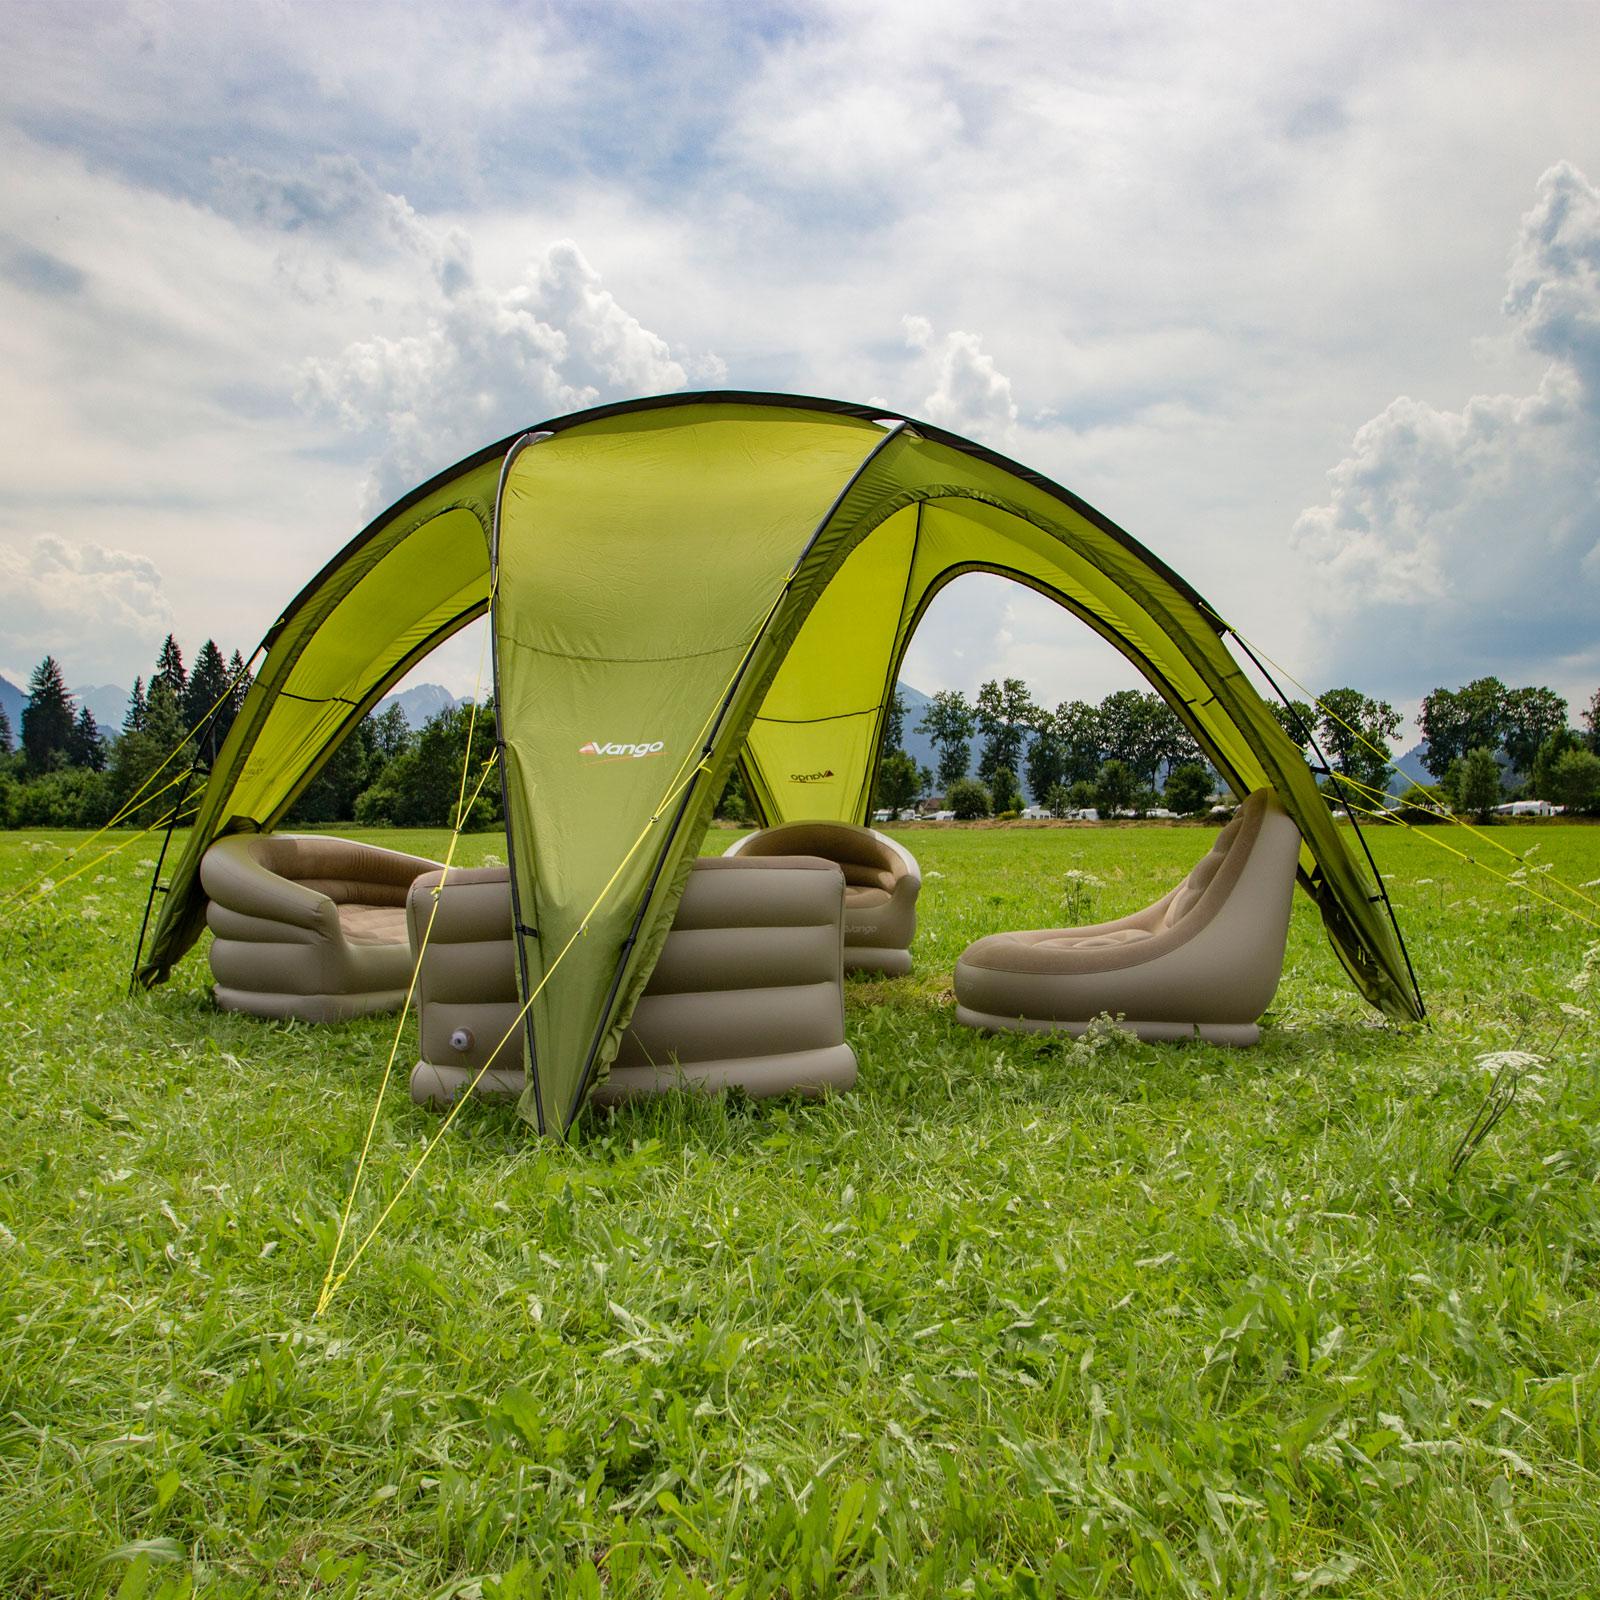 Gartenzelt Hamburg : Vango hogan hub large festival pavillon campingzelt garten